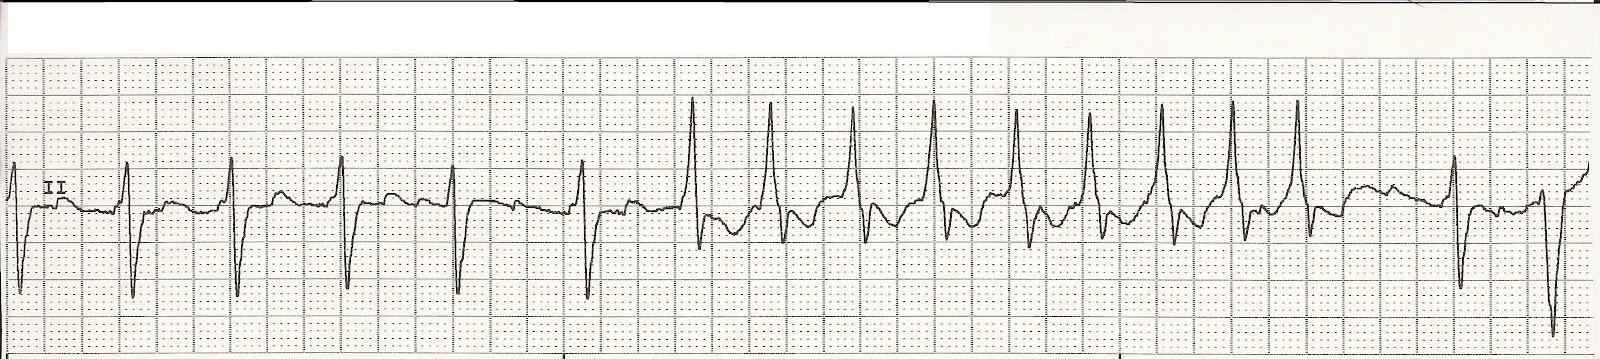 atrial fibrillation with paroxysmal sinus tachycardia b atrial    Paroxysmal Atrial Tachycardia Vs Sinus Tachycardia